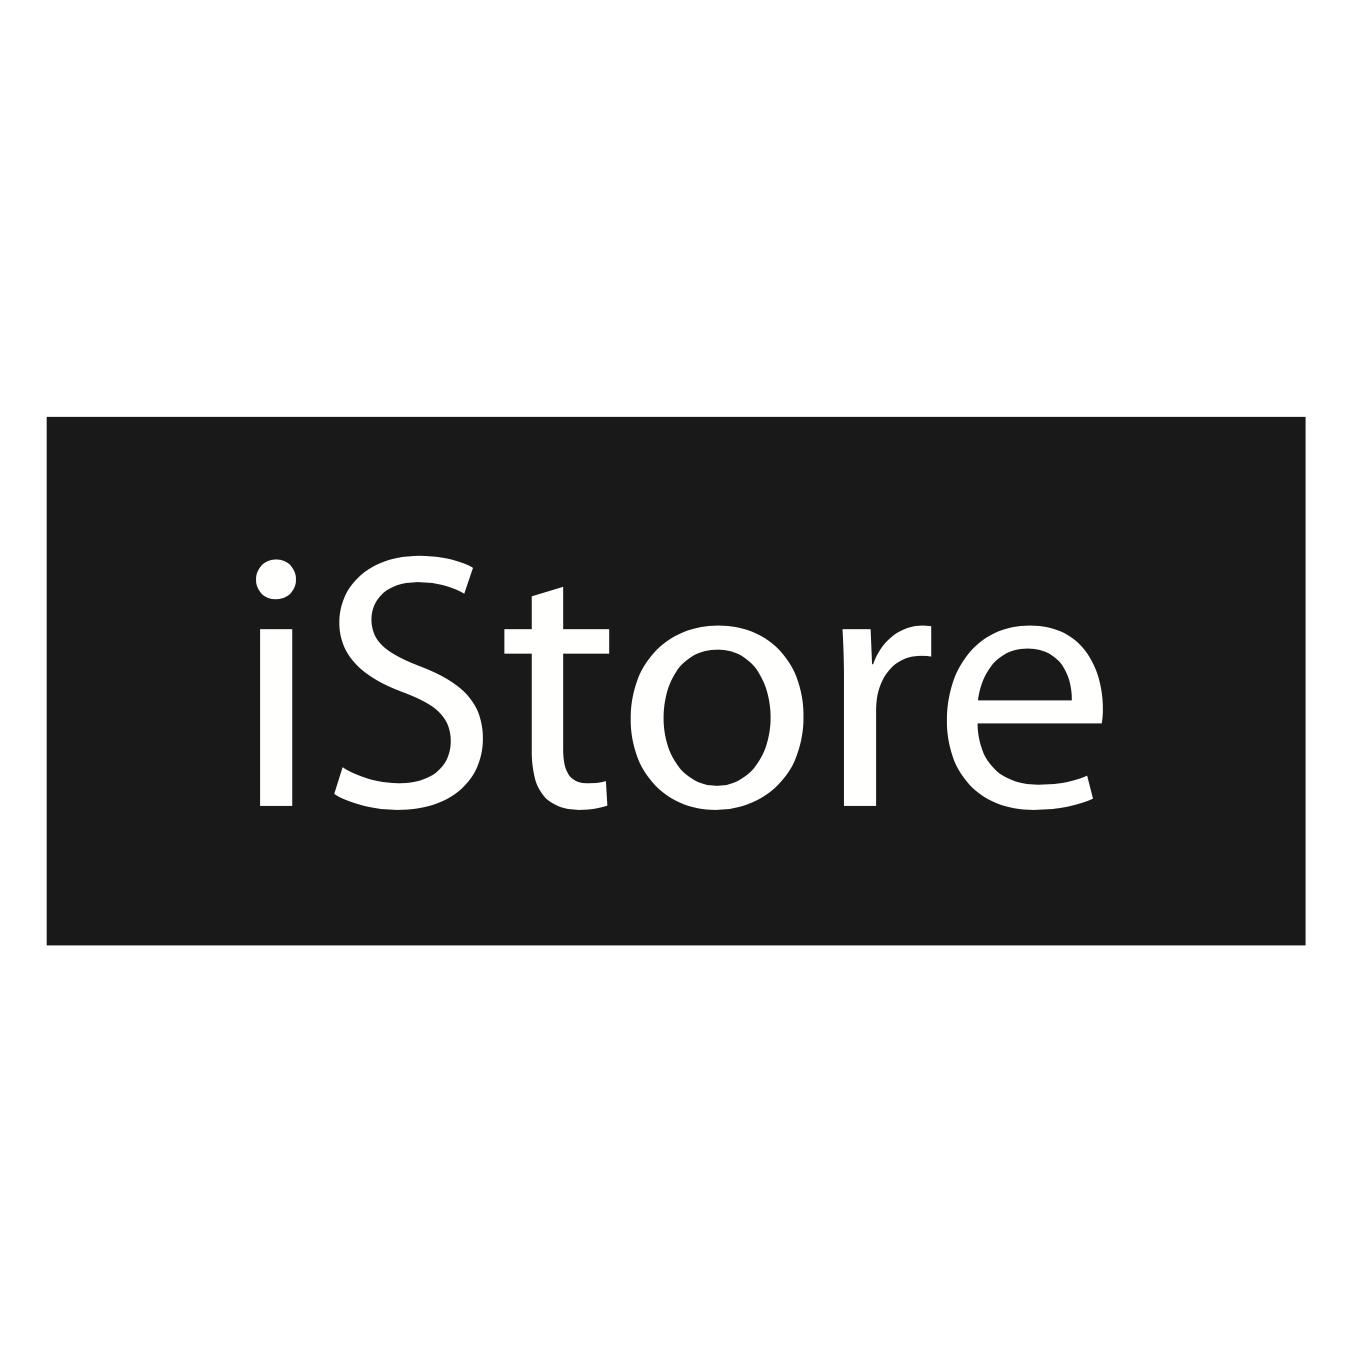 iPhone 6s Plus Silicone Case - Apricot